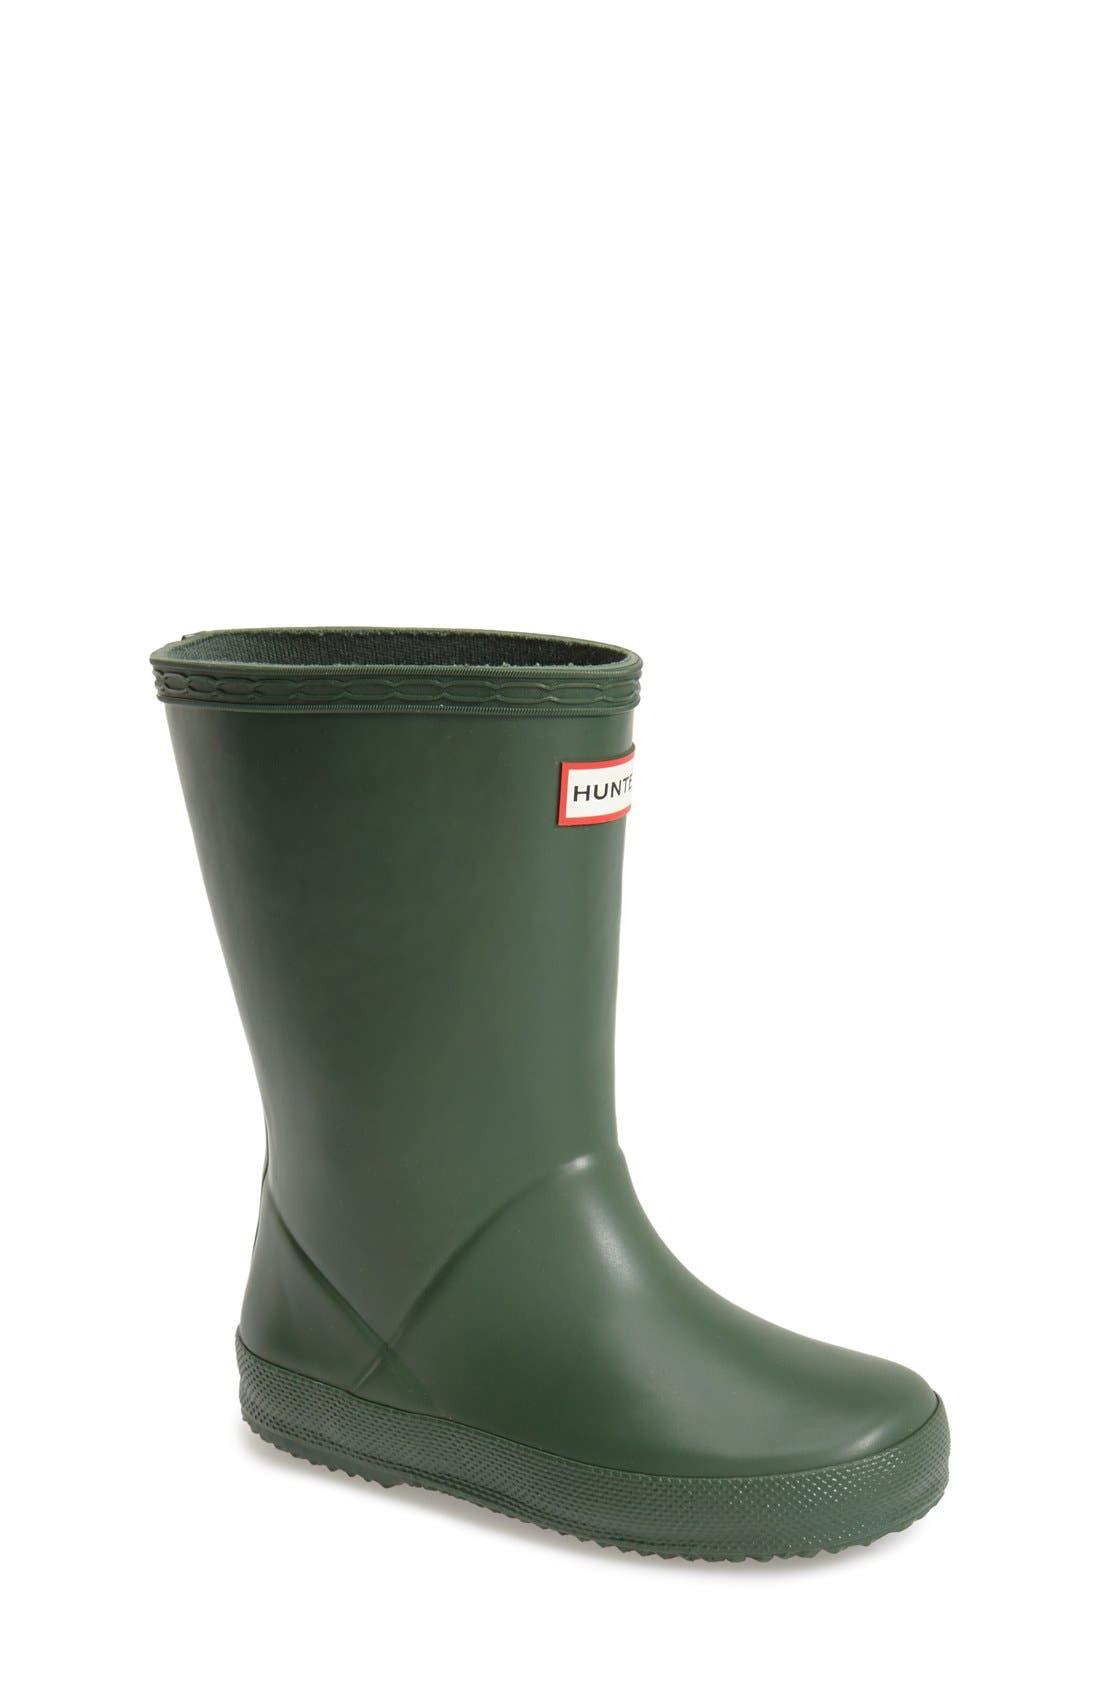 HUNTER First Classic Waterproof Rain Boot, Main, color, HUNTER GREEN